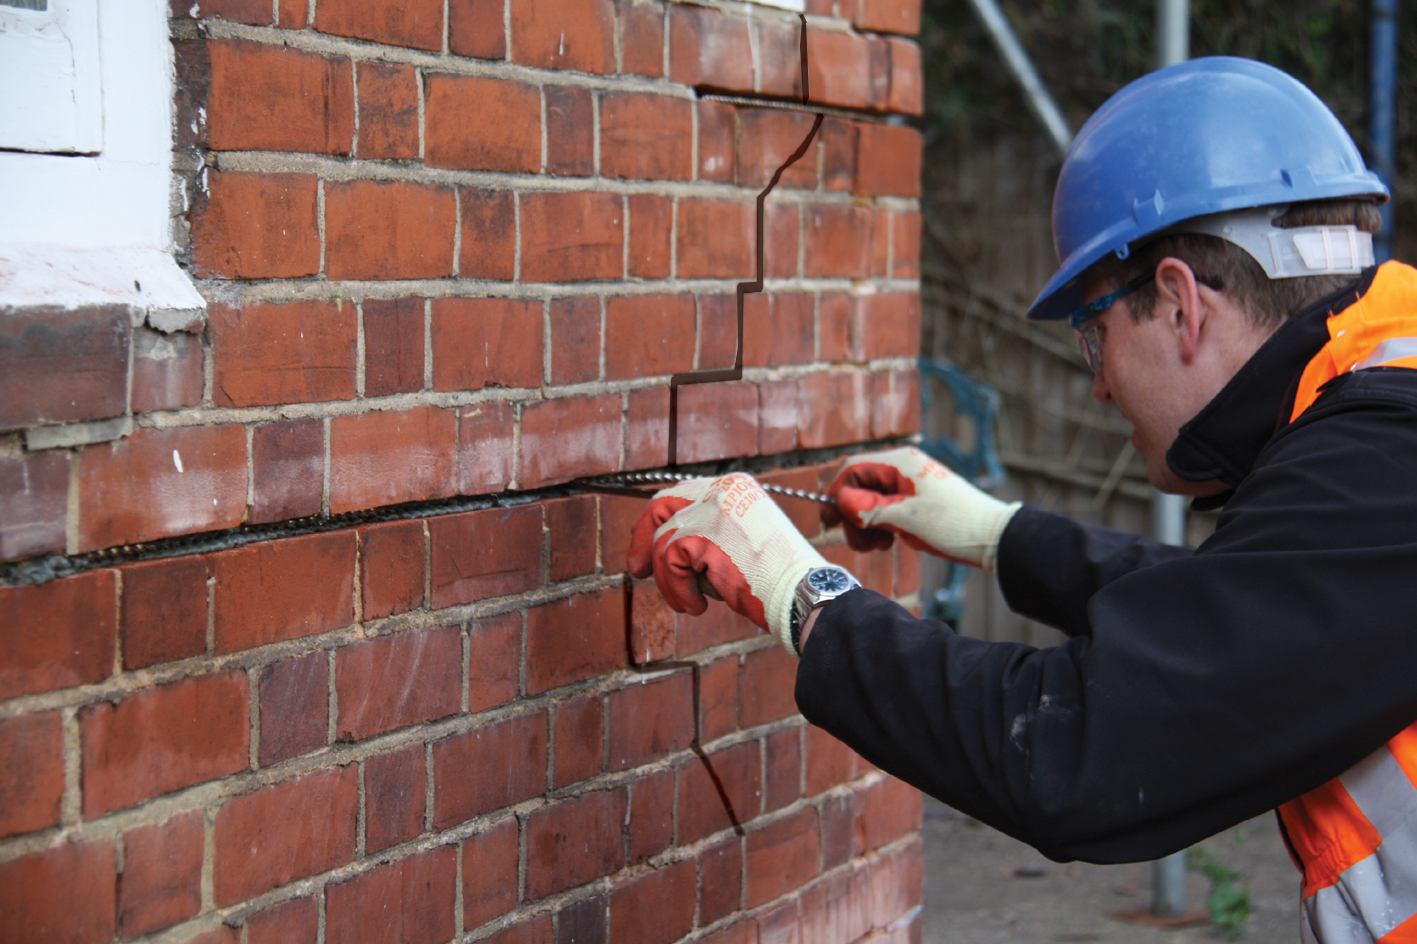 Maintaining Brick Exteriors - Exterior walls, banding and raised patterning, window sills/lintels, chimneys, and foundations.